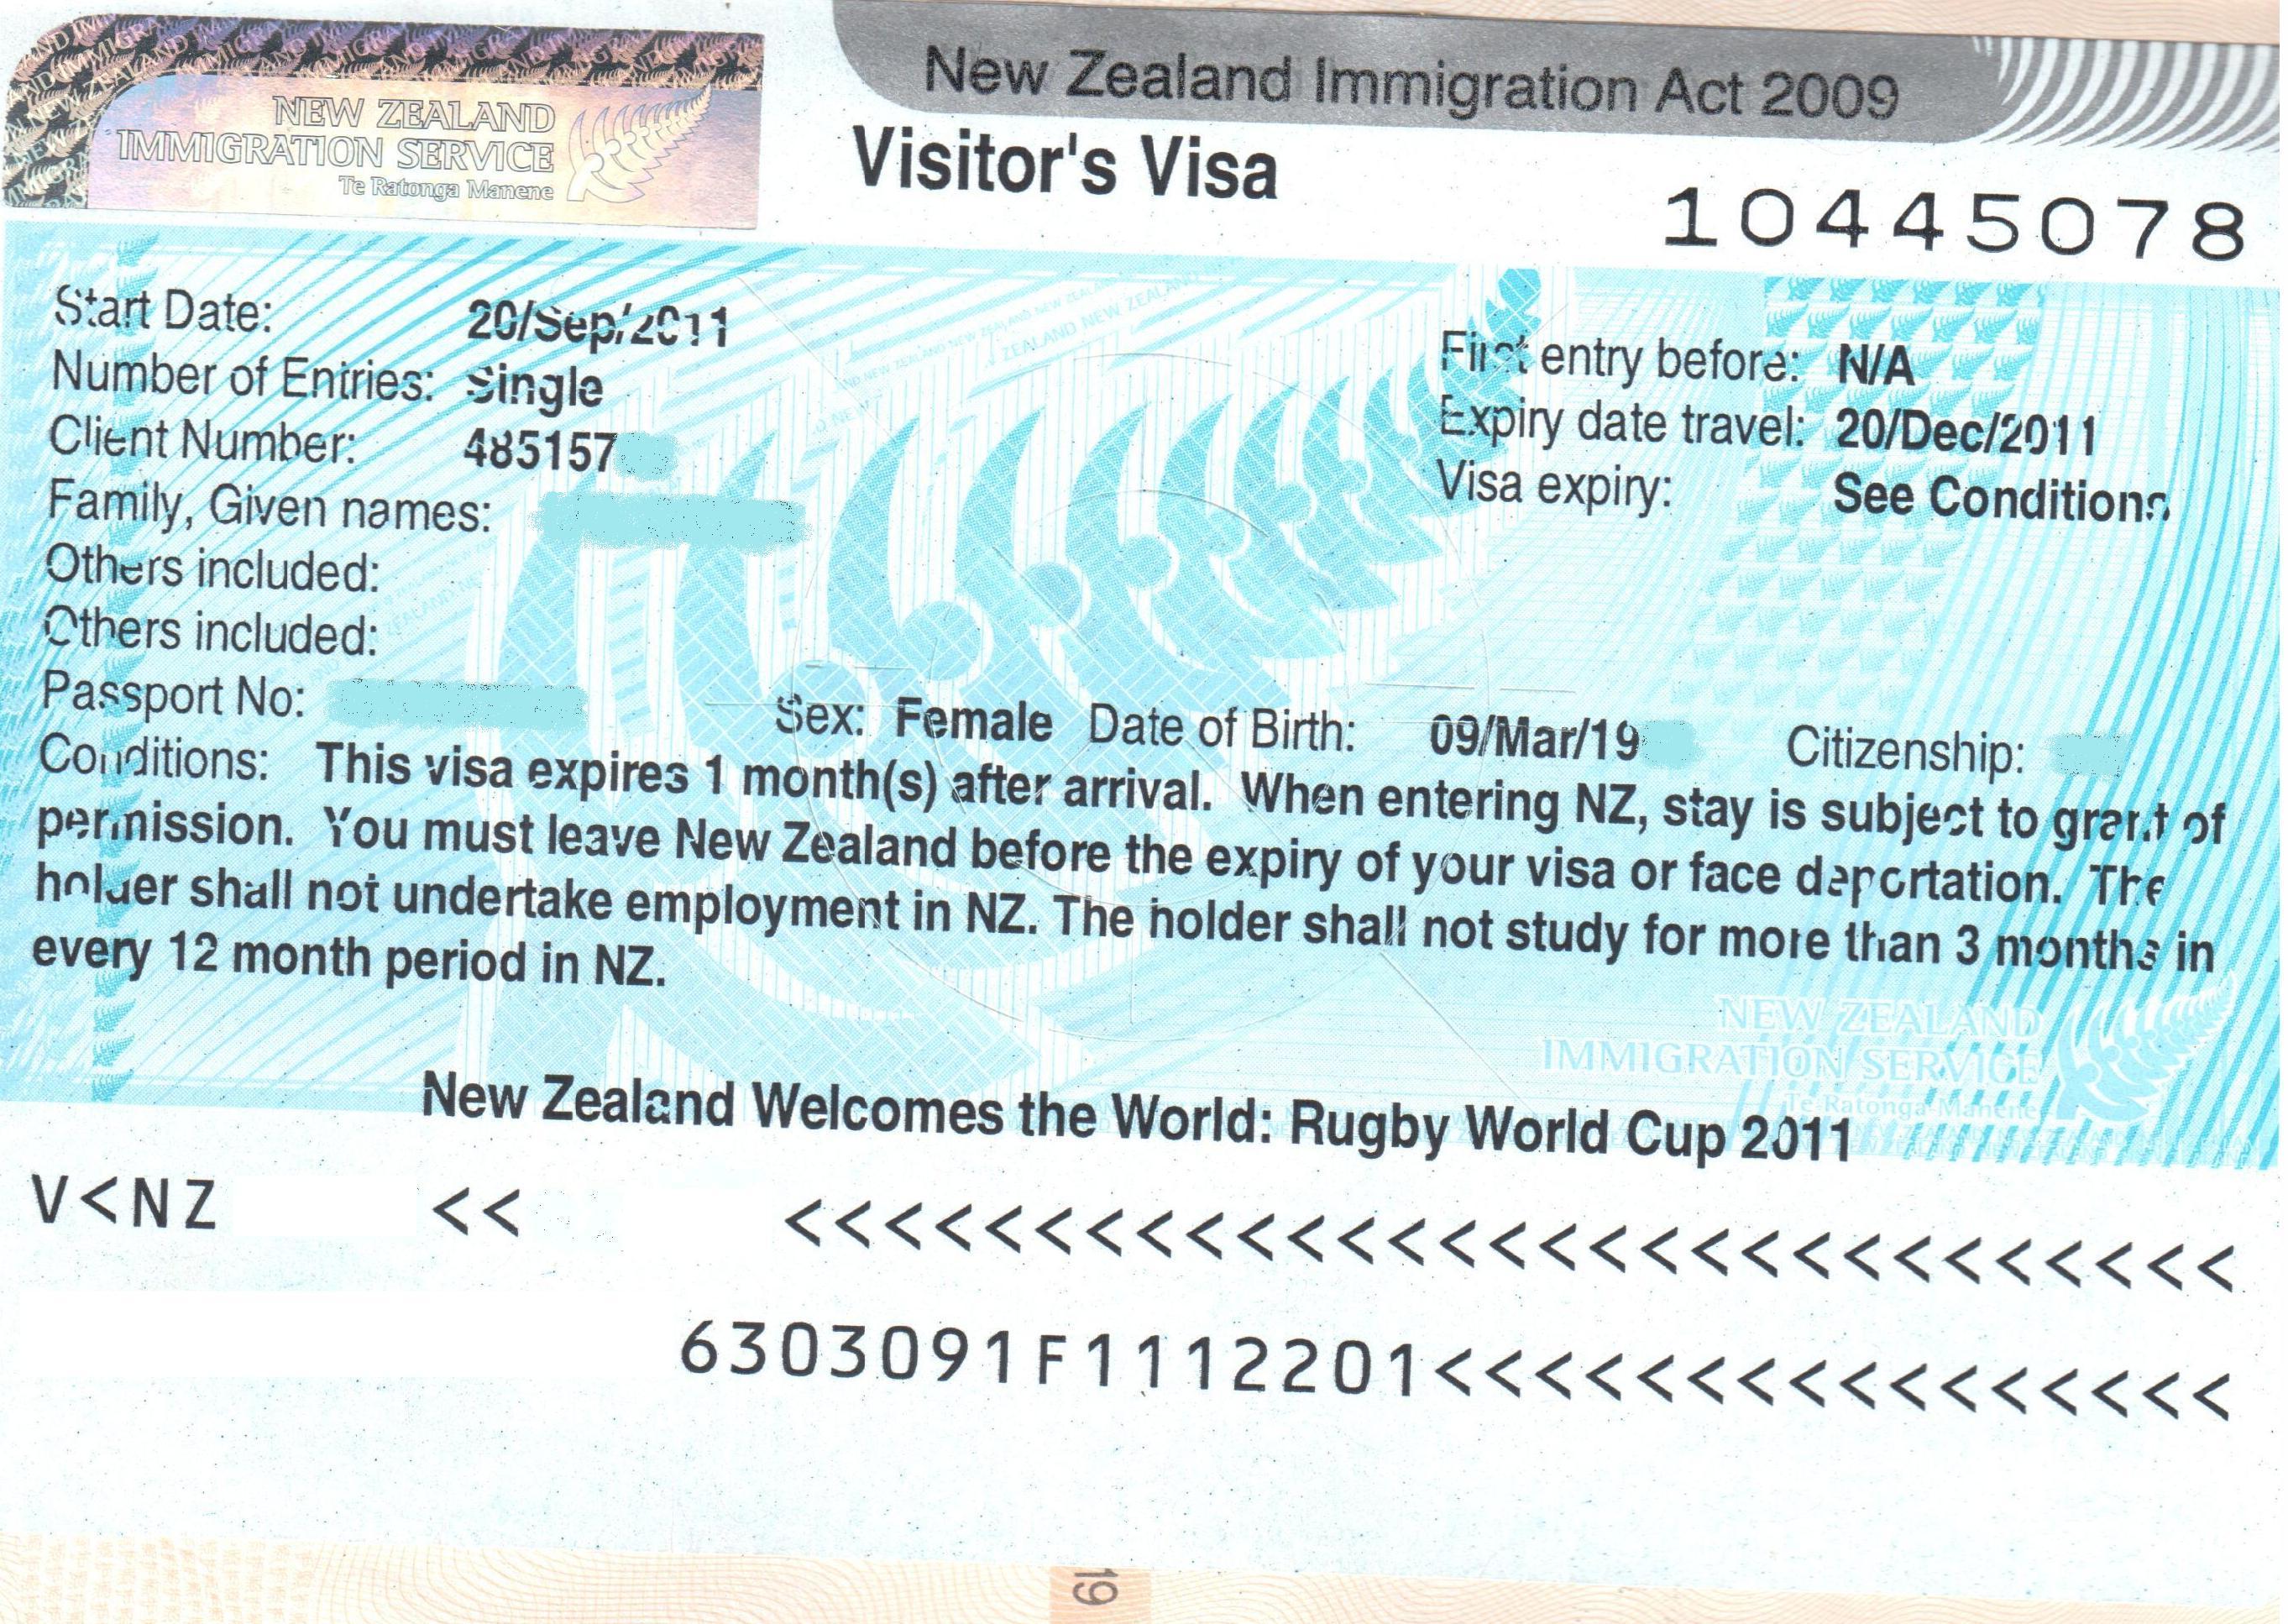 Indonesian passport photo size Russian Passport and Visa Photos - Kodak Express